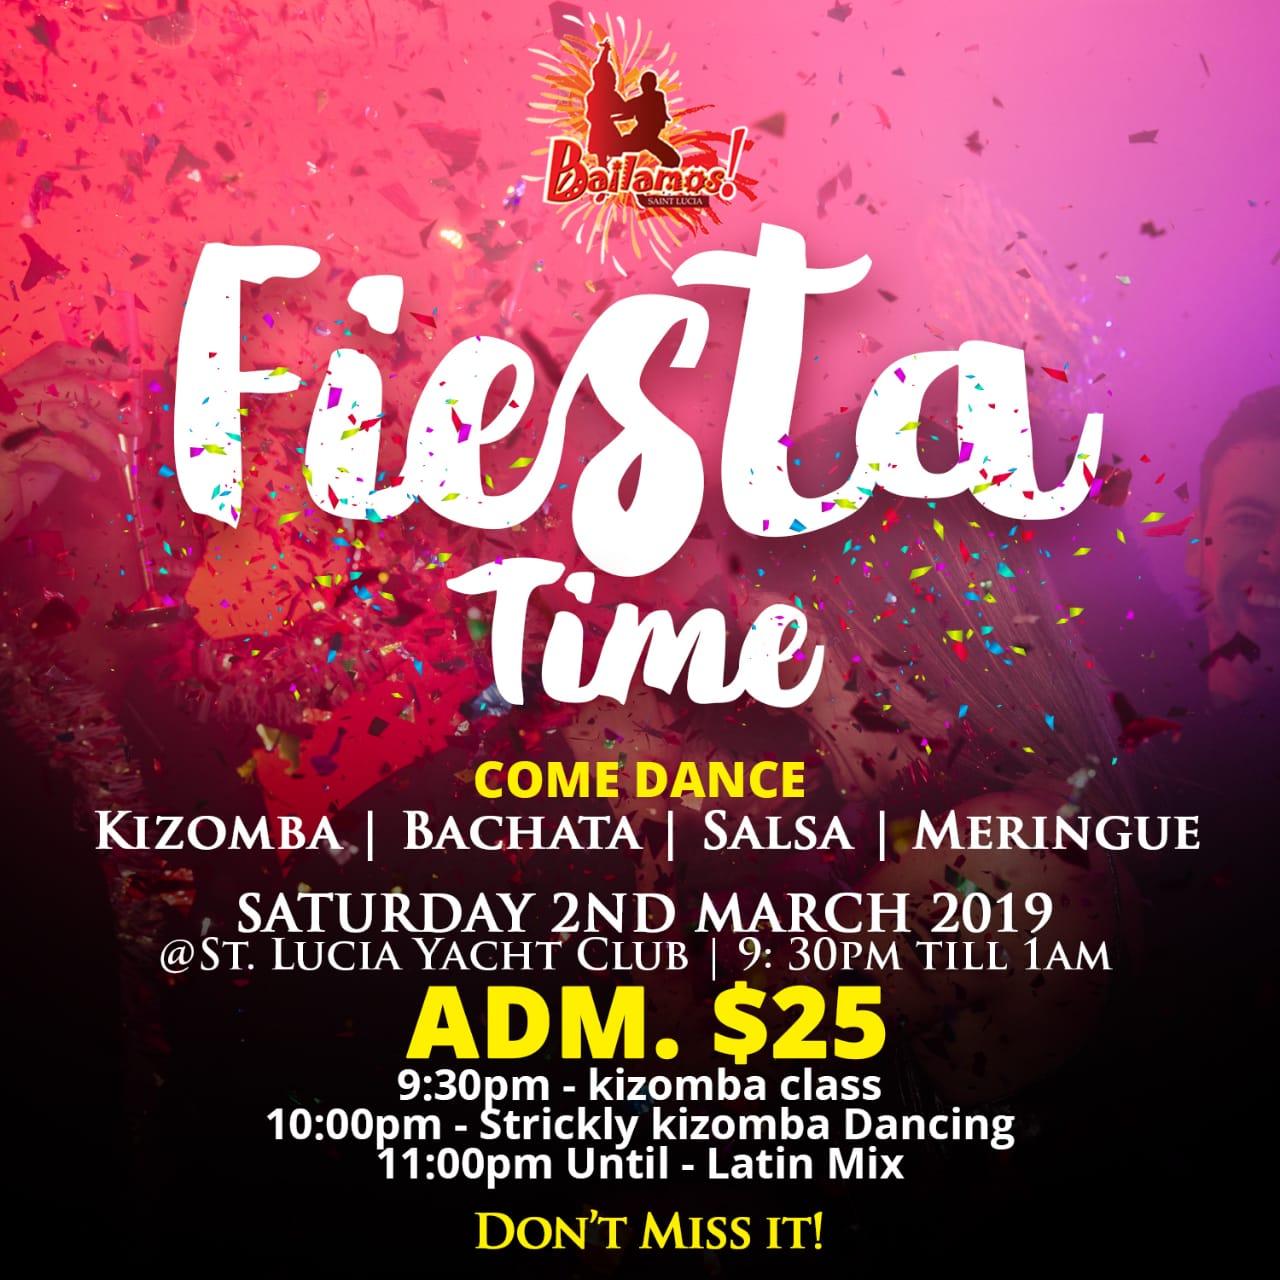 Fiesta Time dance latin kizomba meringue bachata salsa at the yacht club